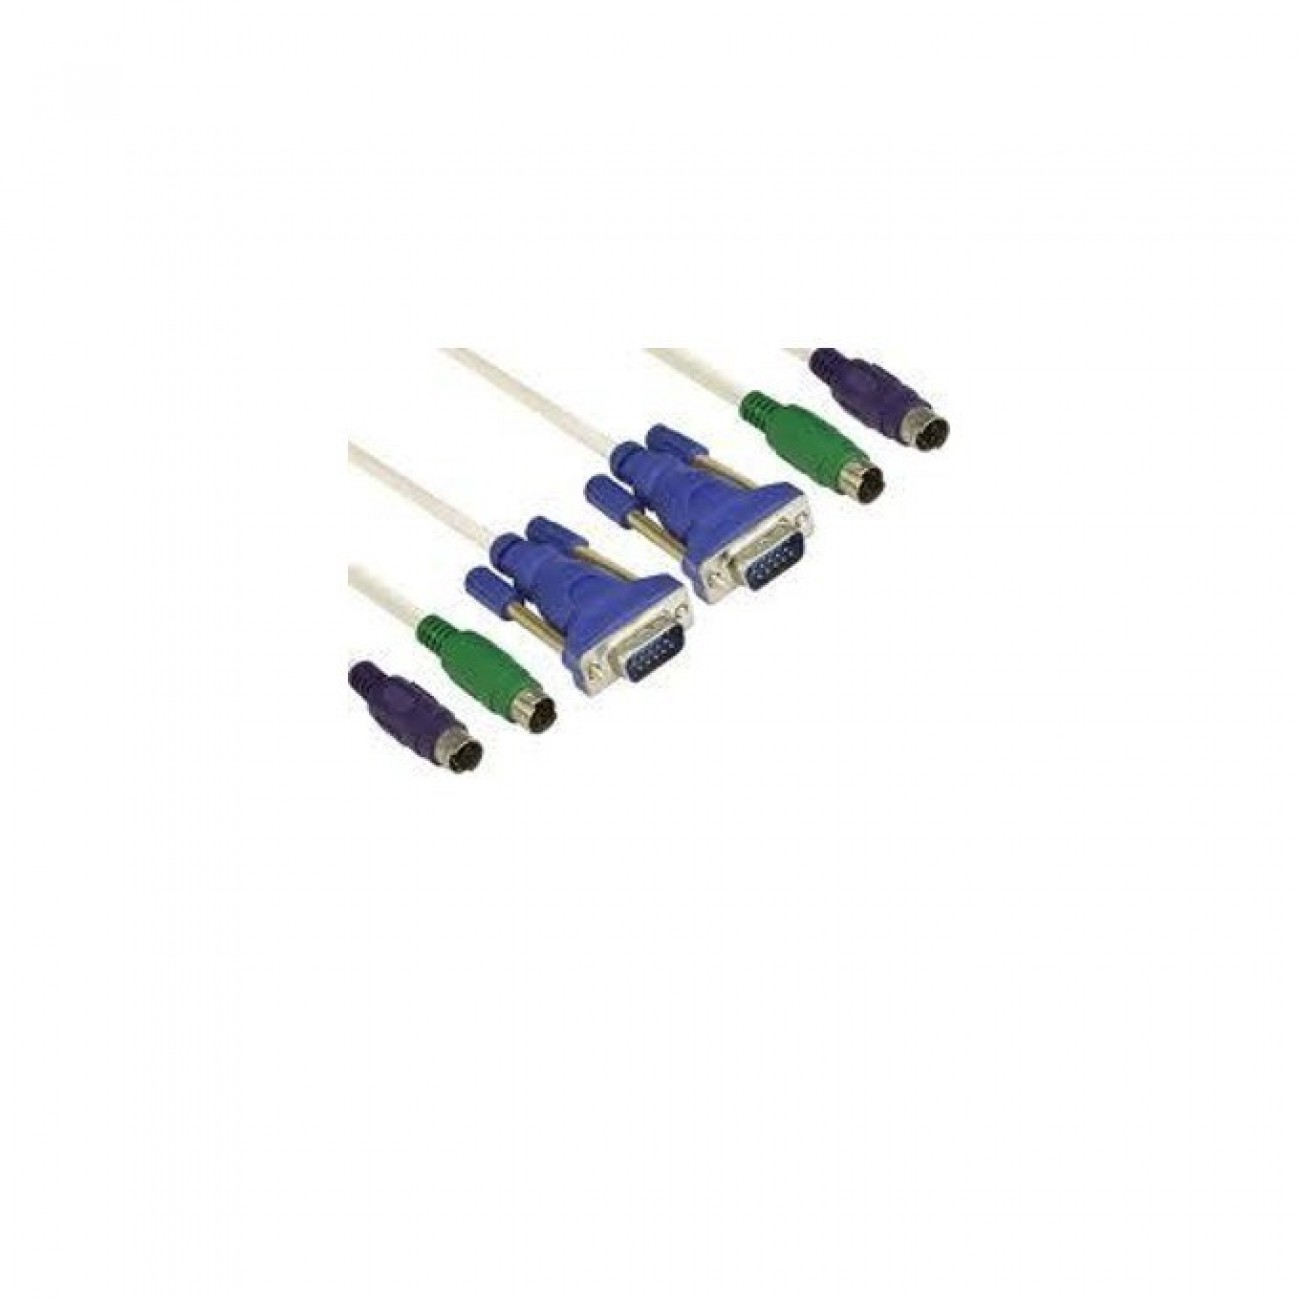 Кабел VCom CK501A-3m, от (VGA + 2x PS/2)(м) към (VGA + 2x PS/2)(м), за KVM switch, 3m